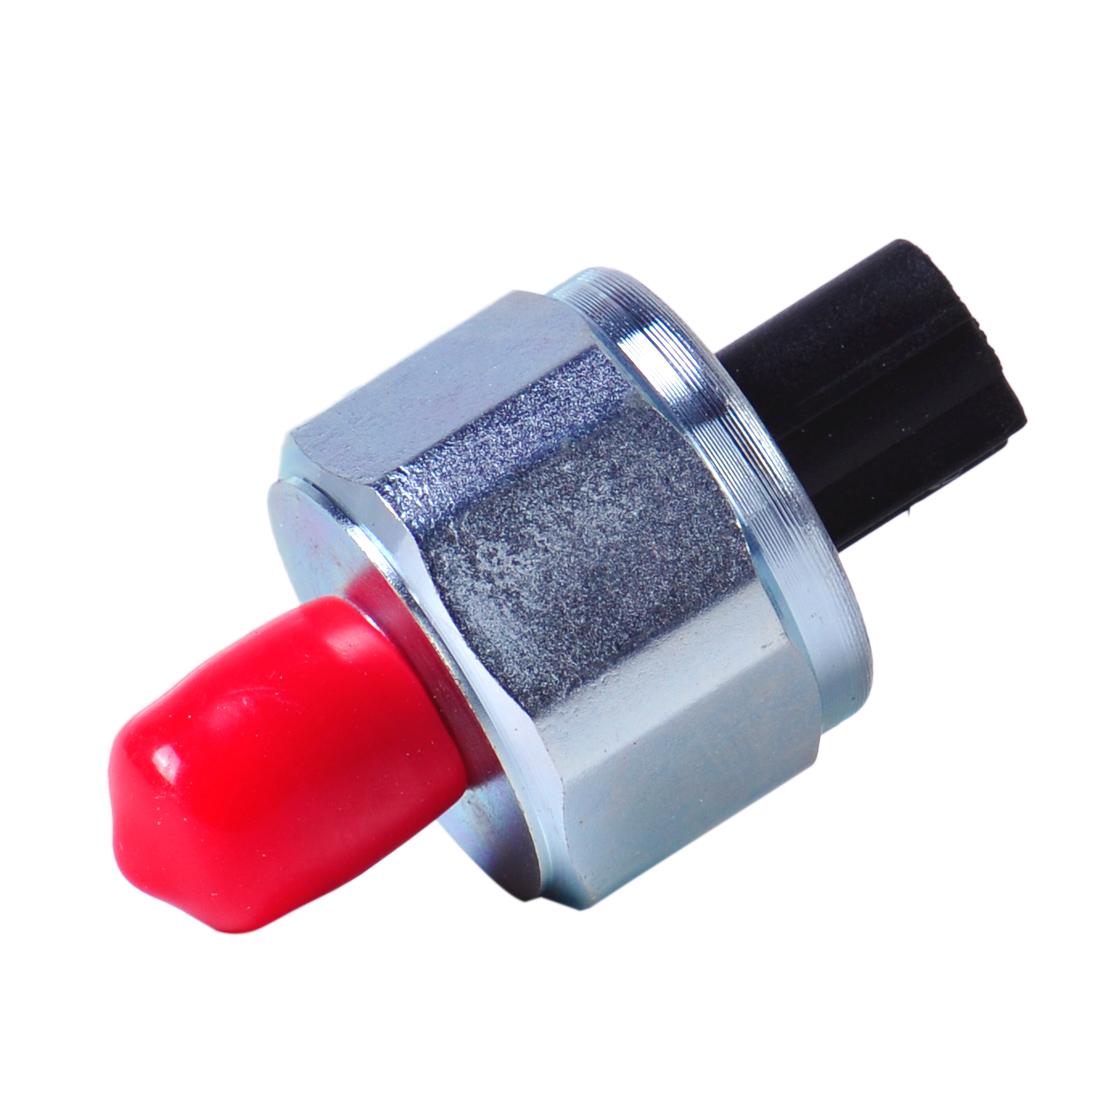 Knock Sensor Fit For Acura Honda Accord Civic 30530-PPL